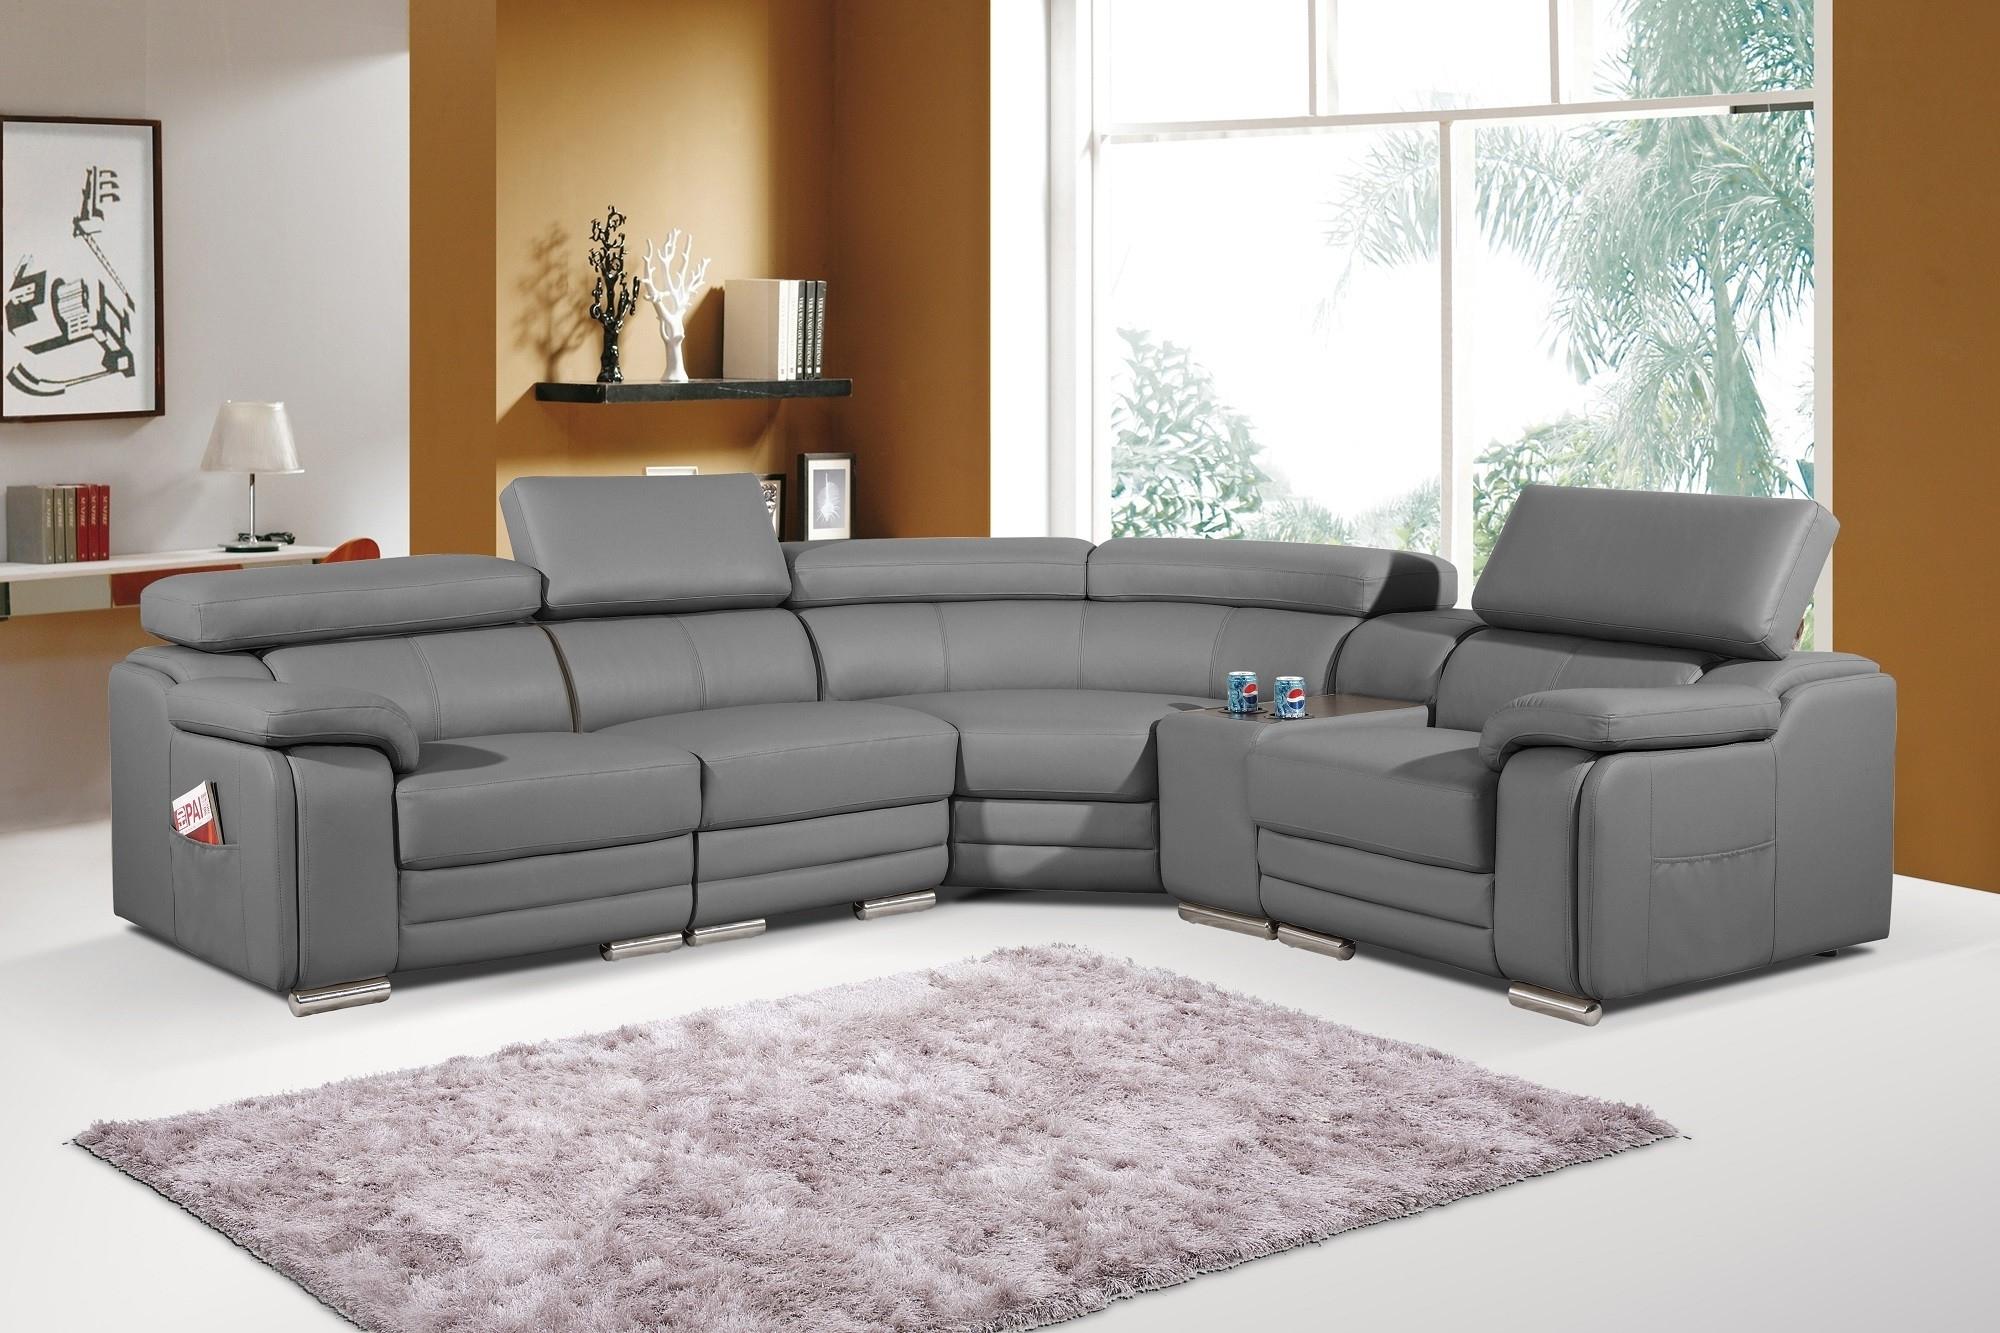 Best And Newest Leather Corner Sofas Inside Dakota Grey Bonded Leather Corner Sofa Left/hand (View 2 of 20)